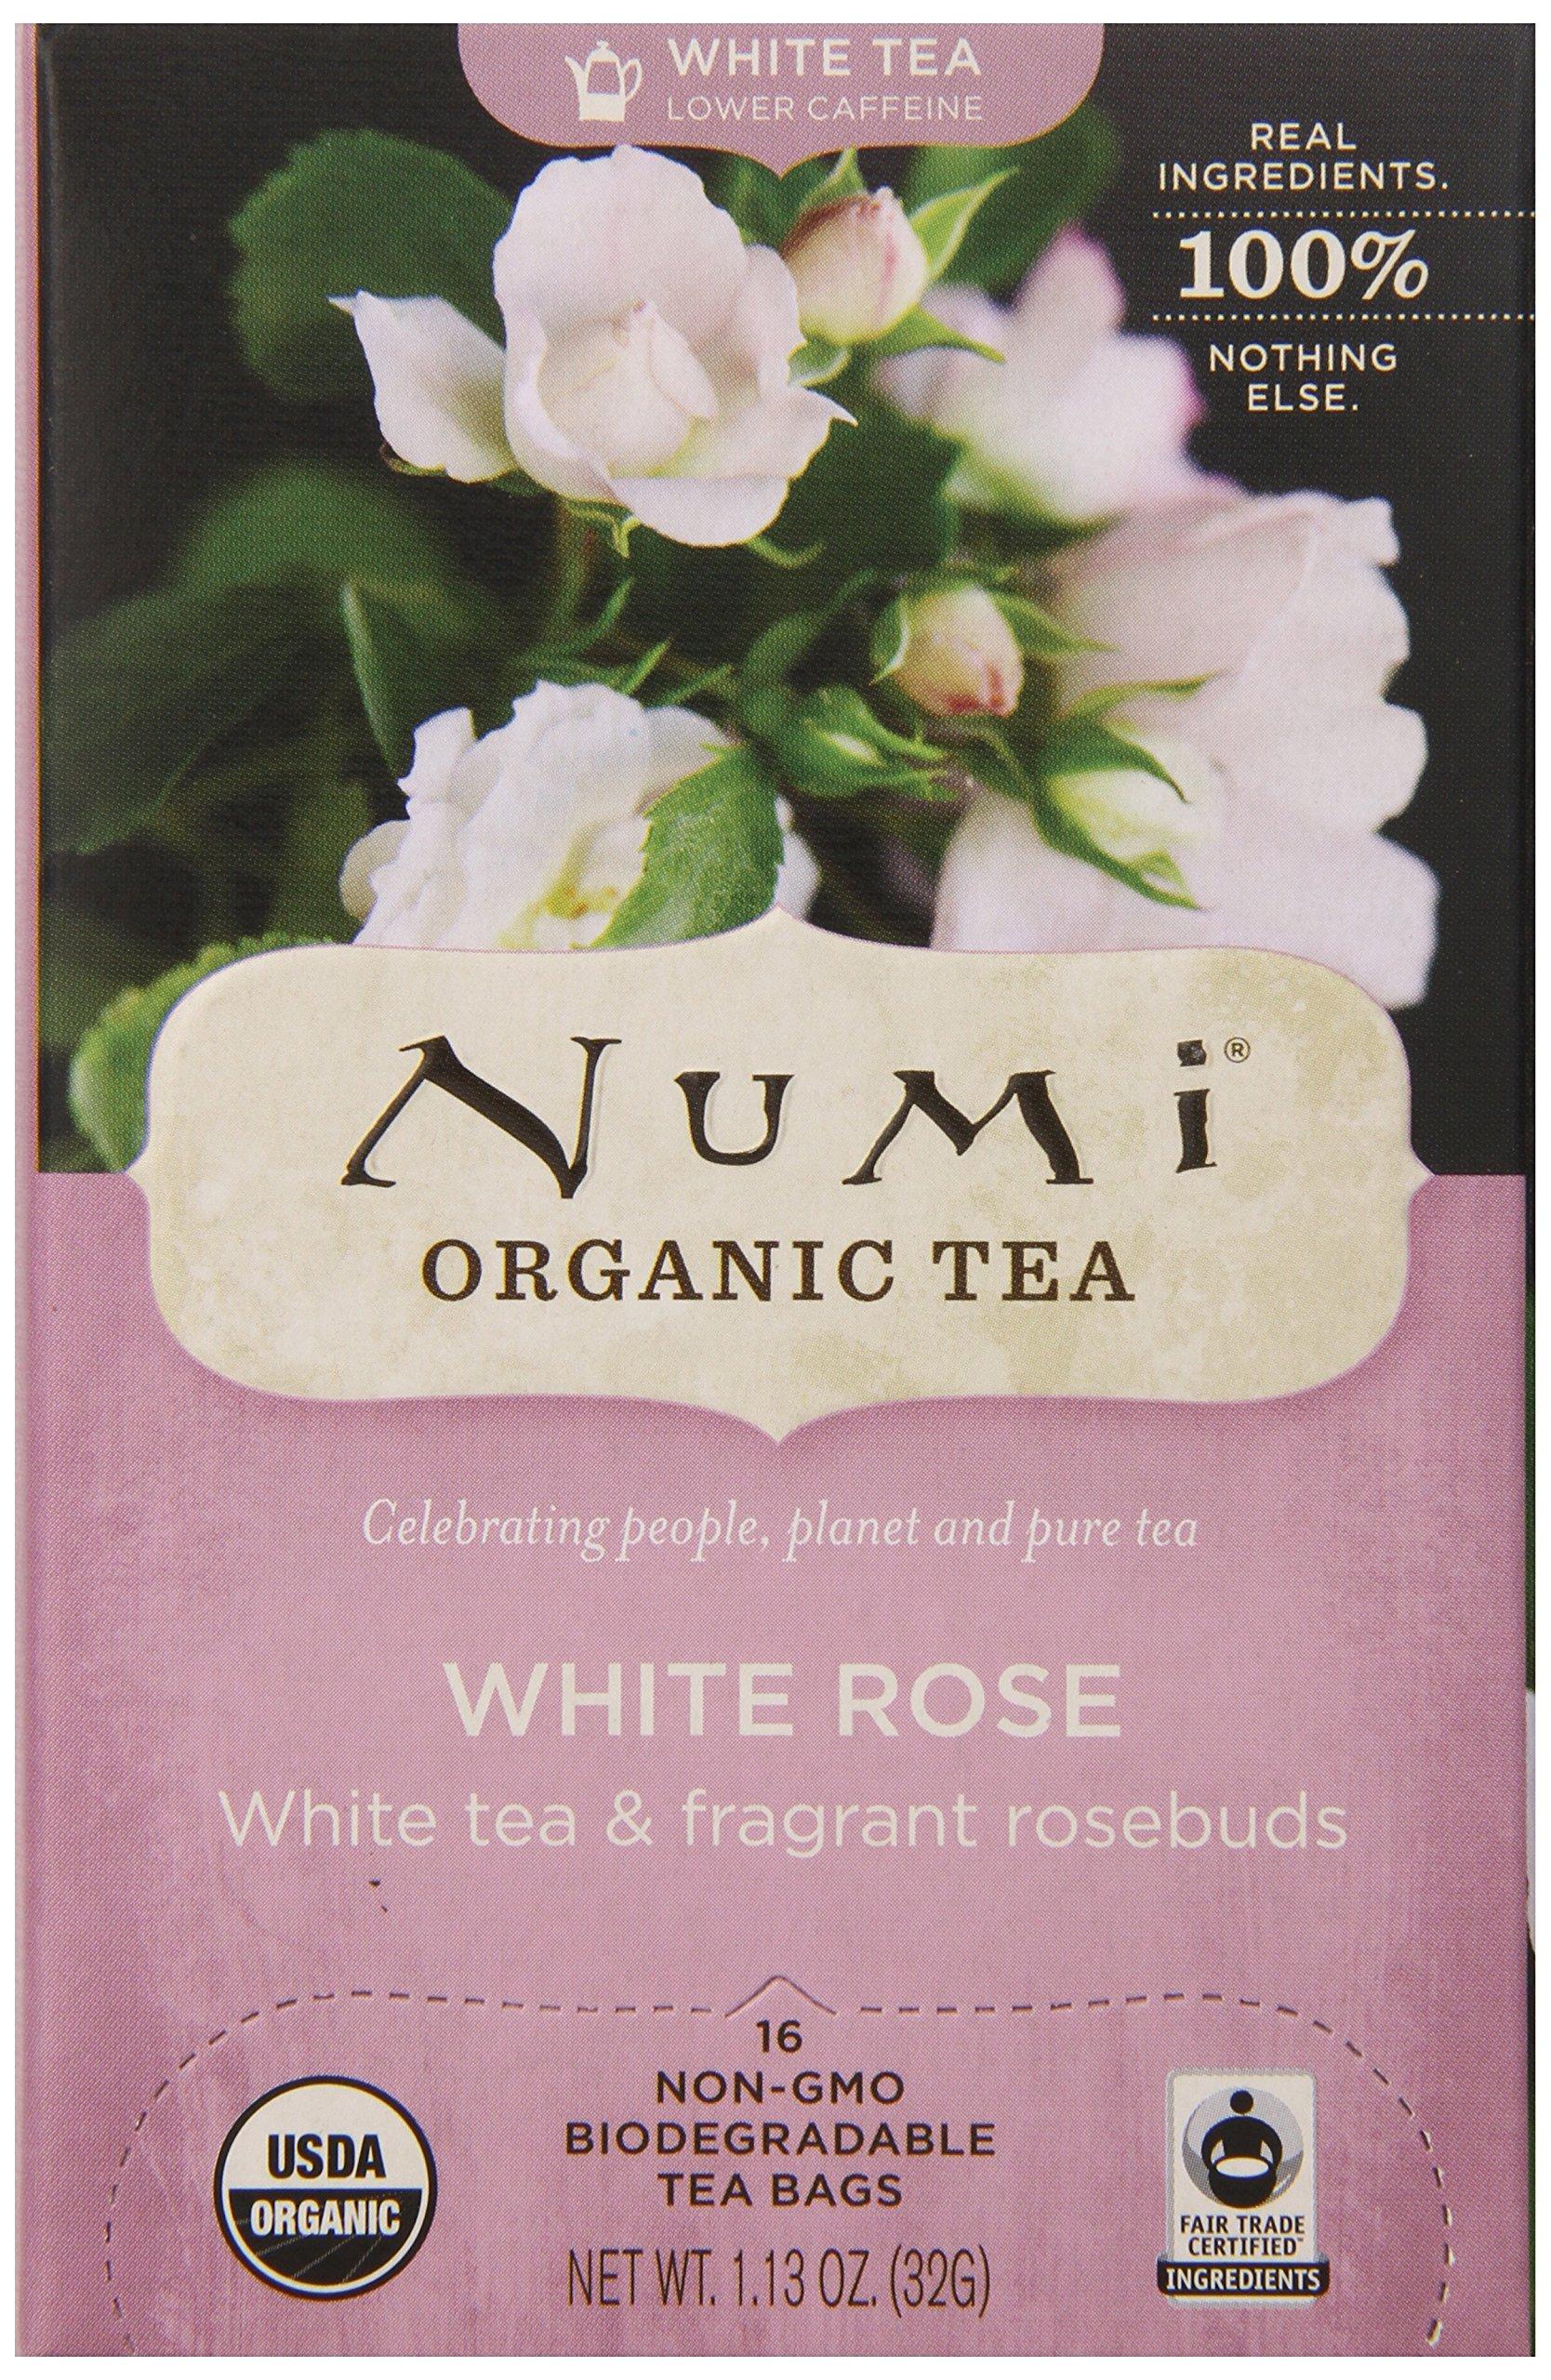 Numi Organic Tea White Rose, 16 Count Box of Tea Bags (Pack of 6) White Tea by Numi